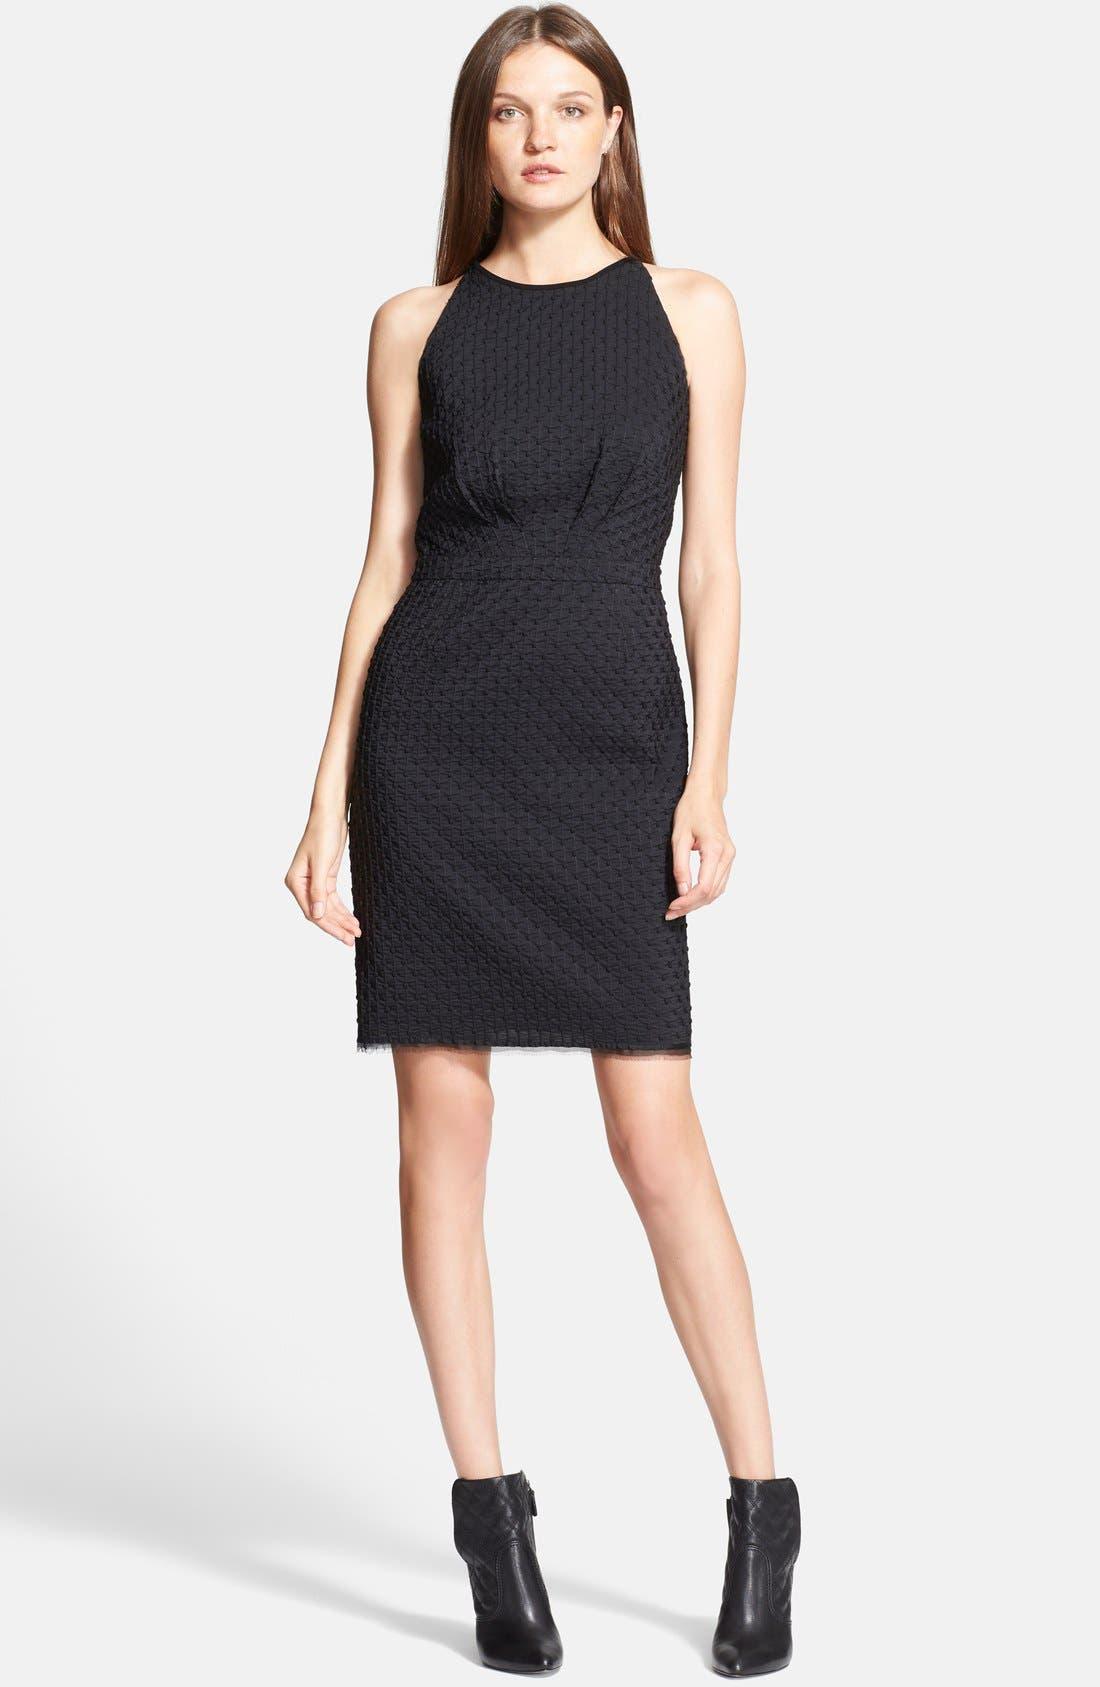 Alternate Image 1 Selected - Tory Burch 'Ivana' Corded Dot Sheath Dress